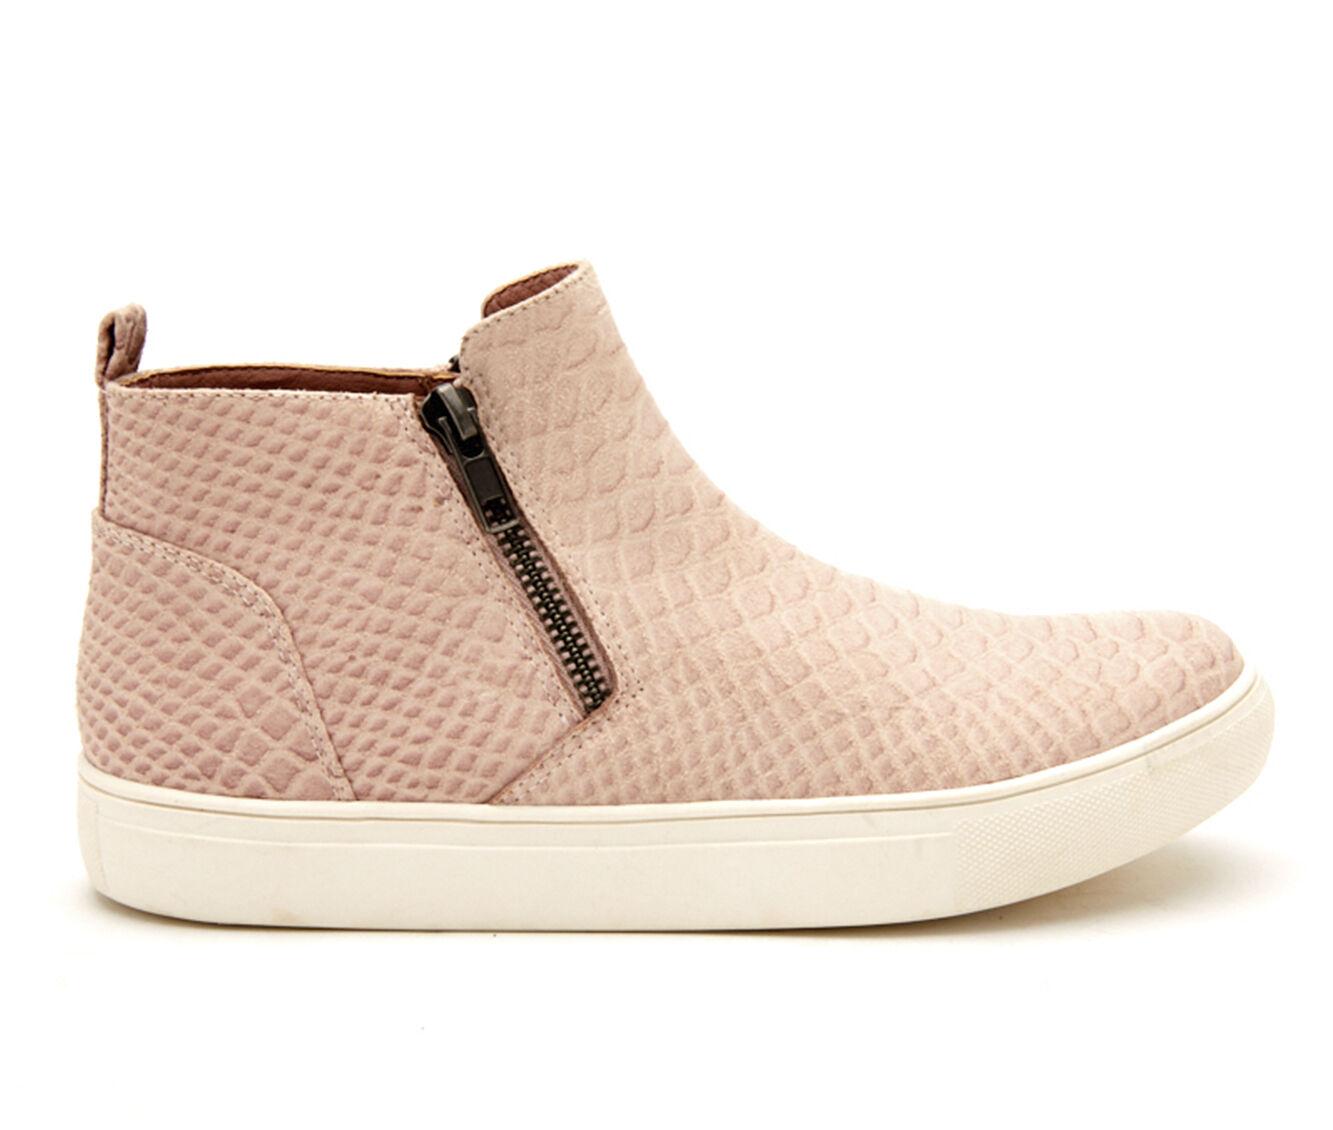 Designer For Sale Women's Coconuts Goya Sneakers PINK